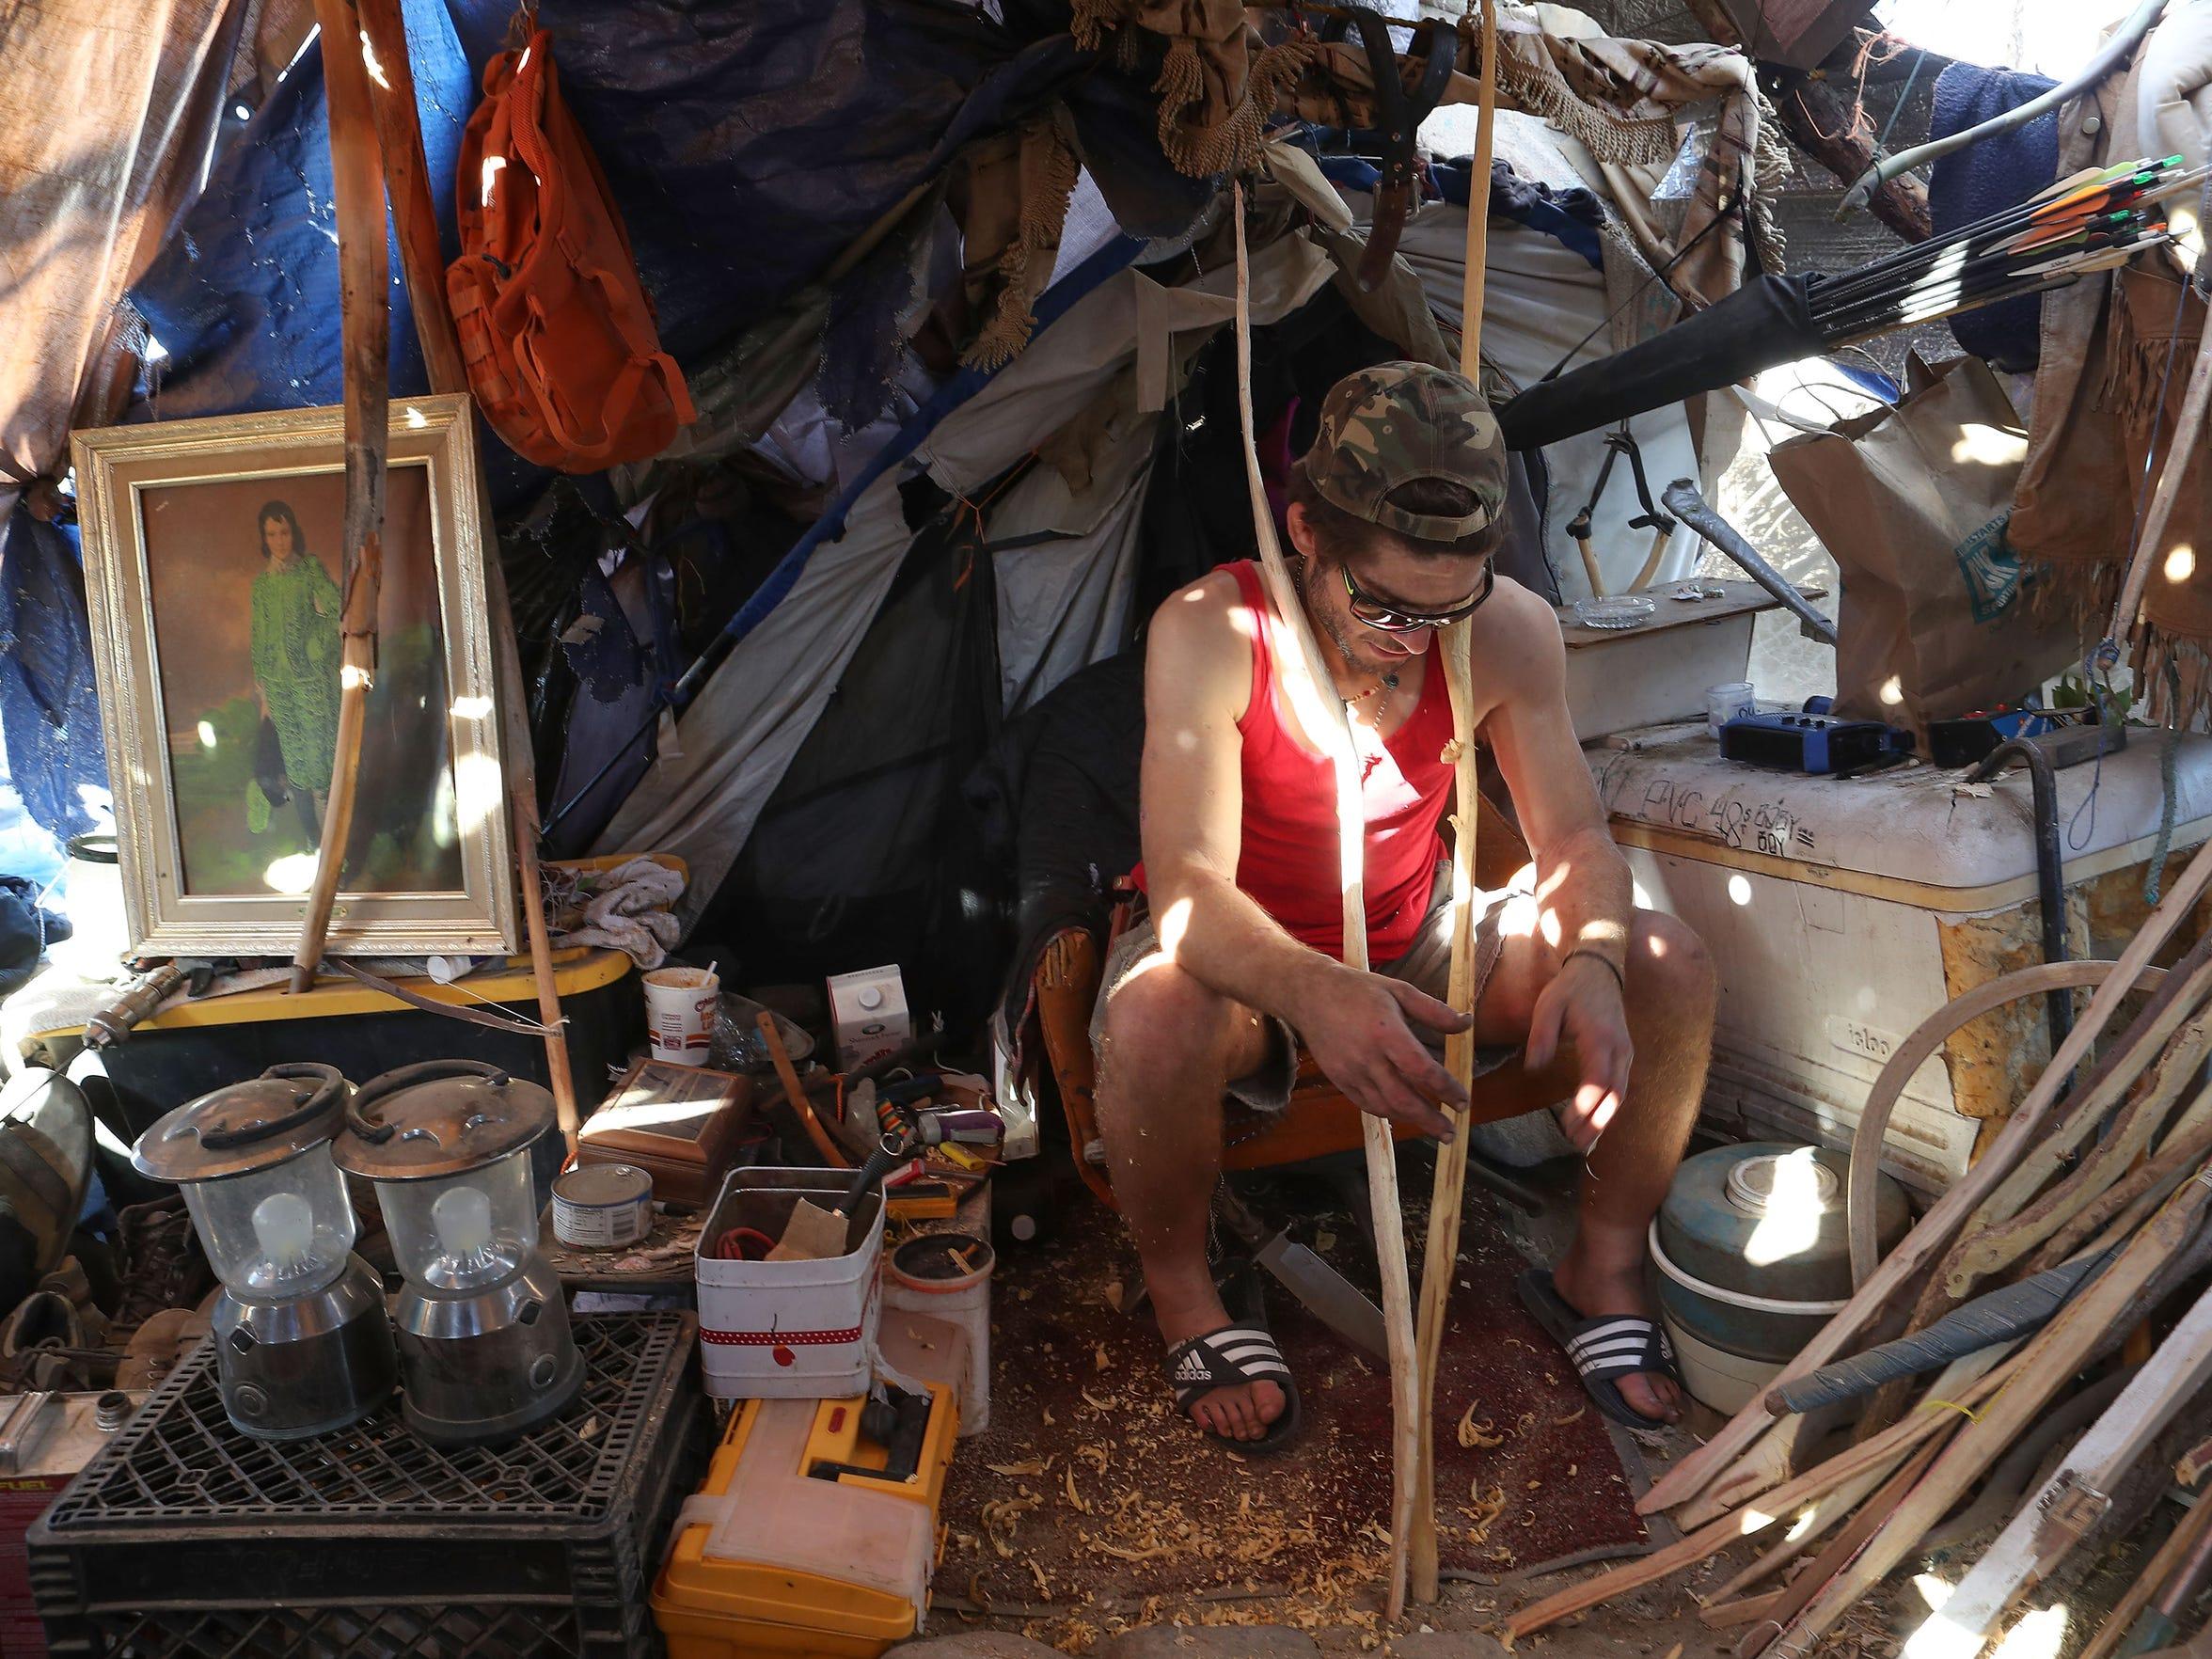 Inside of his makeshift home David Donzanti contemplates